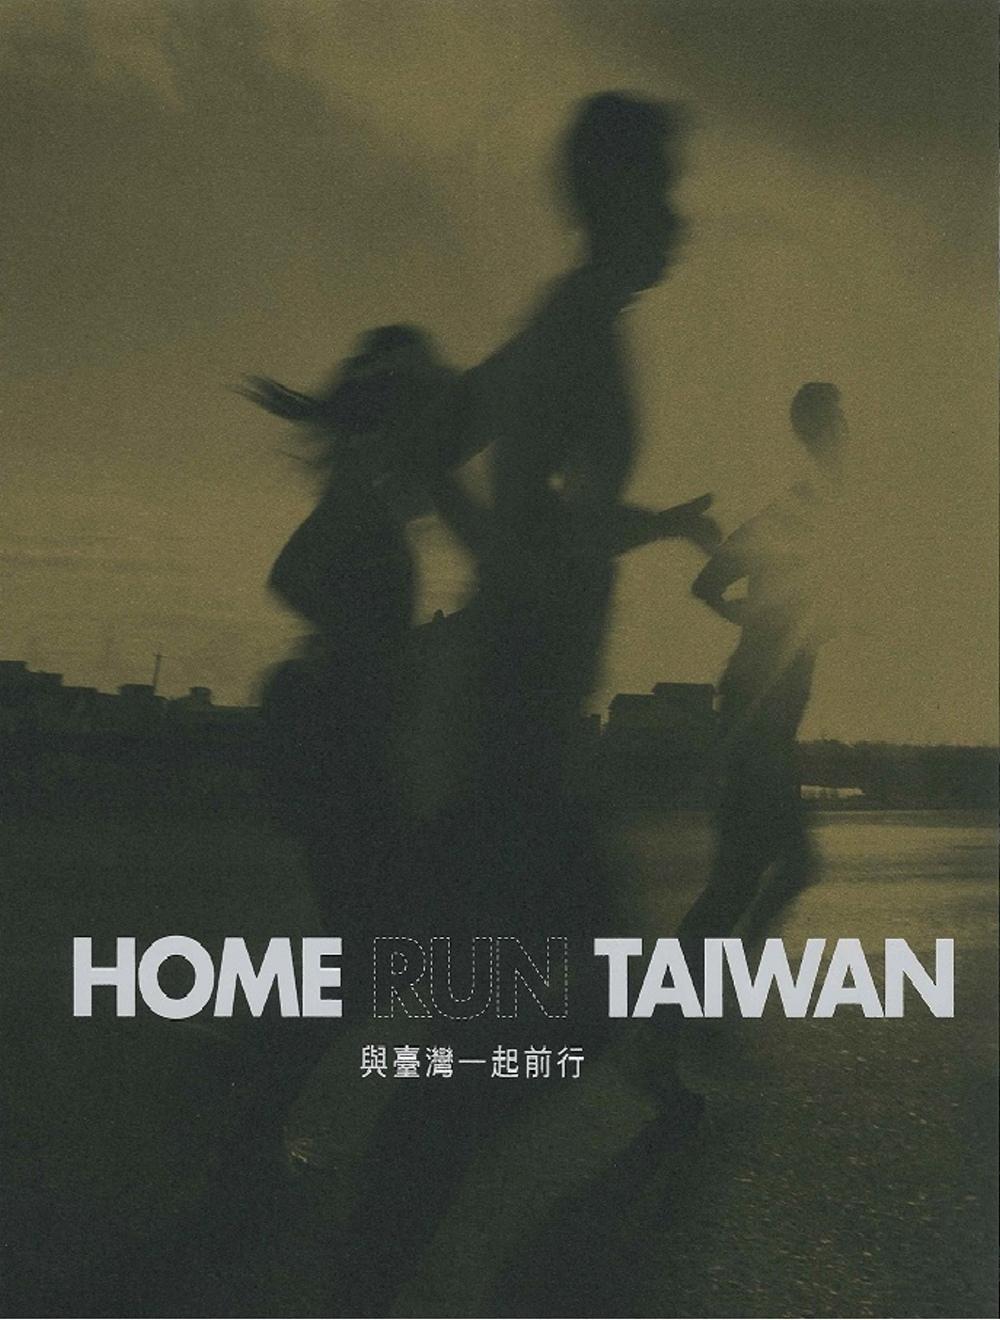 HOME RUN TAIWAN  與臺灣一起前行